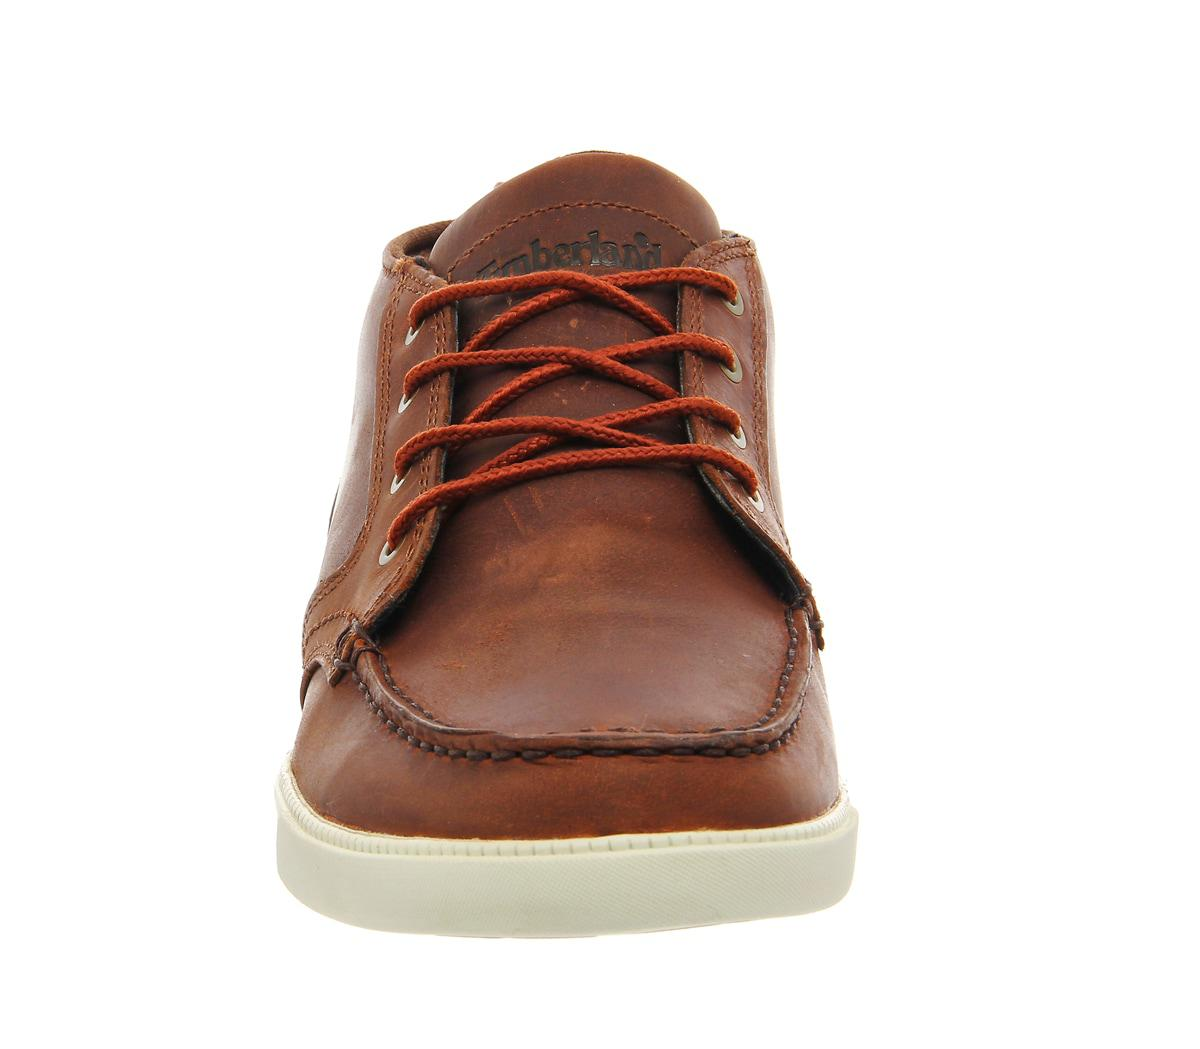 Timberland Brown Newmarket Fulk Lp Chukka Moc Toe for men